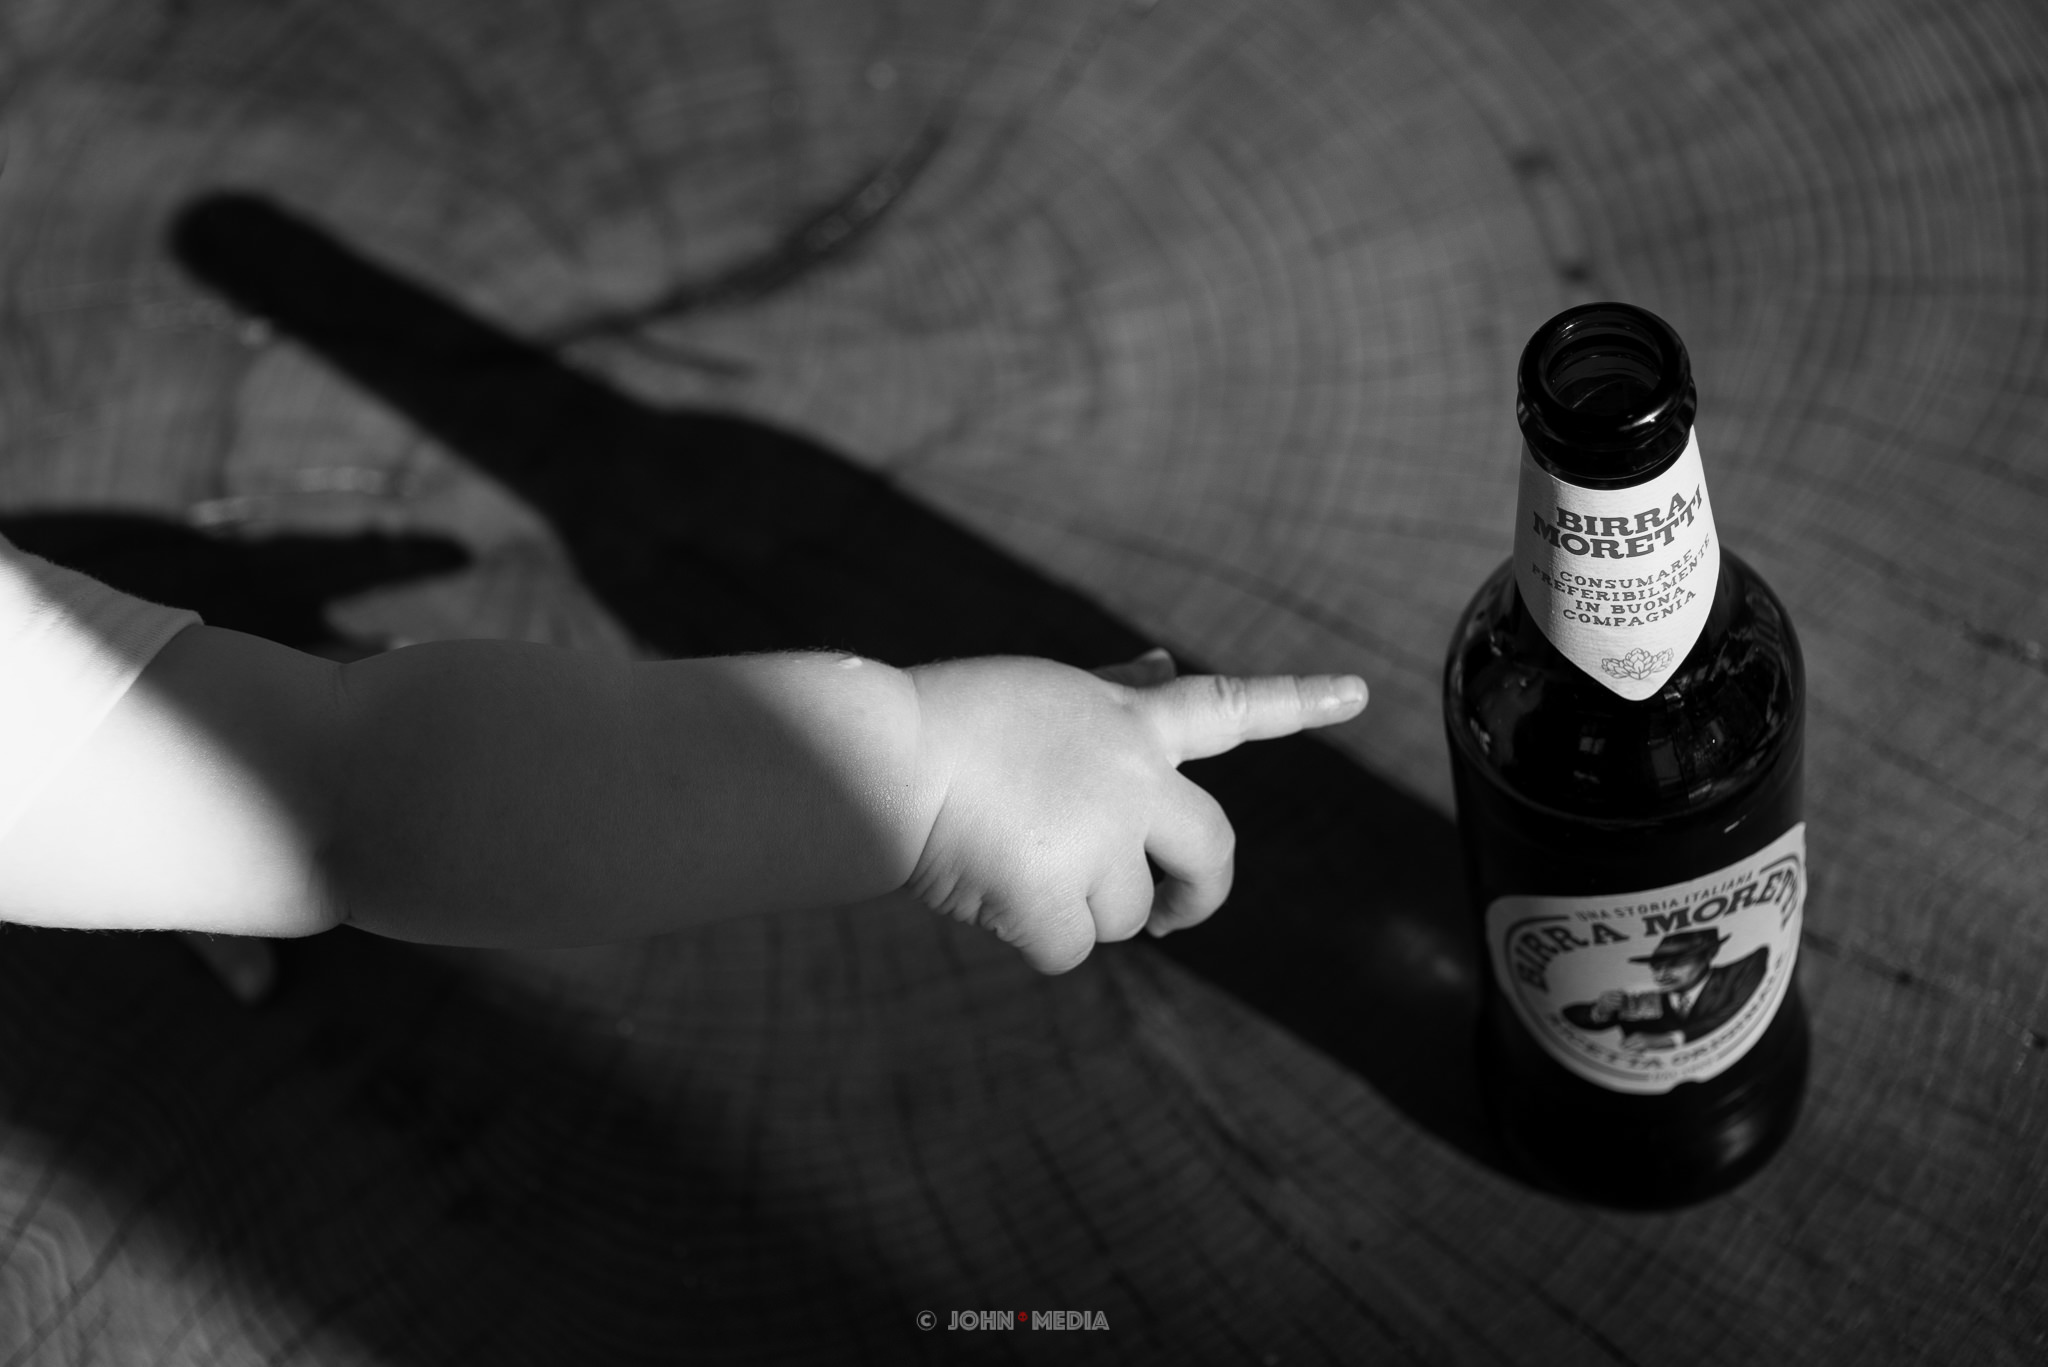 Birra baby